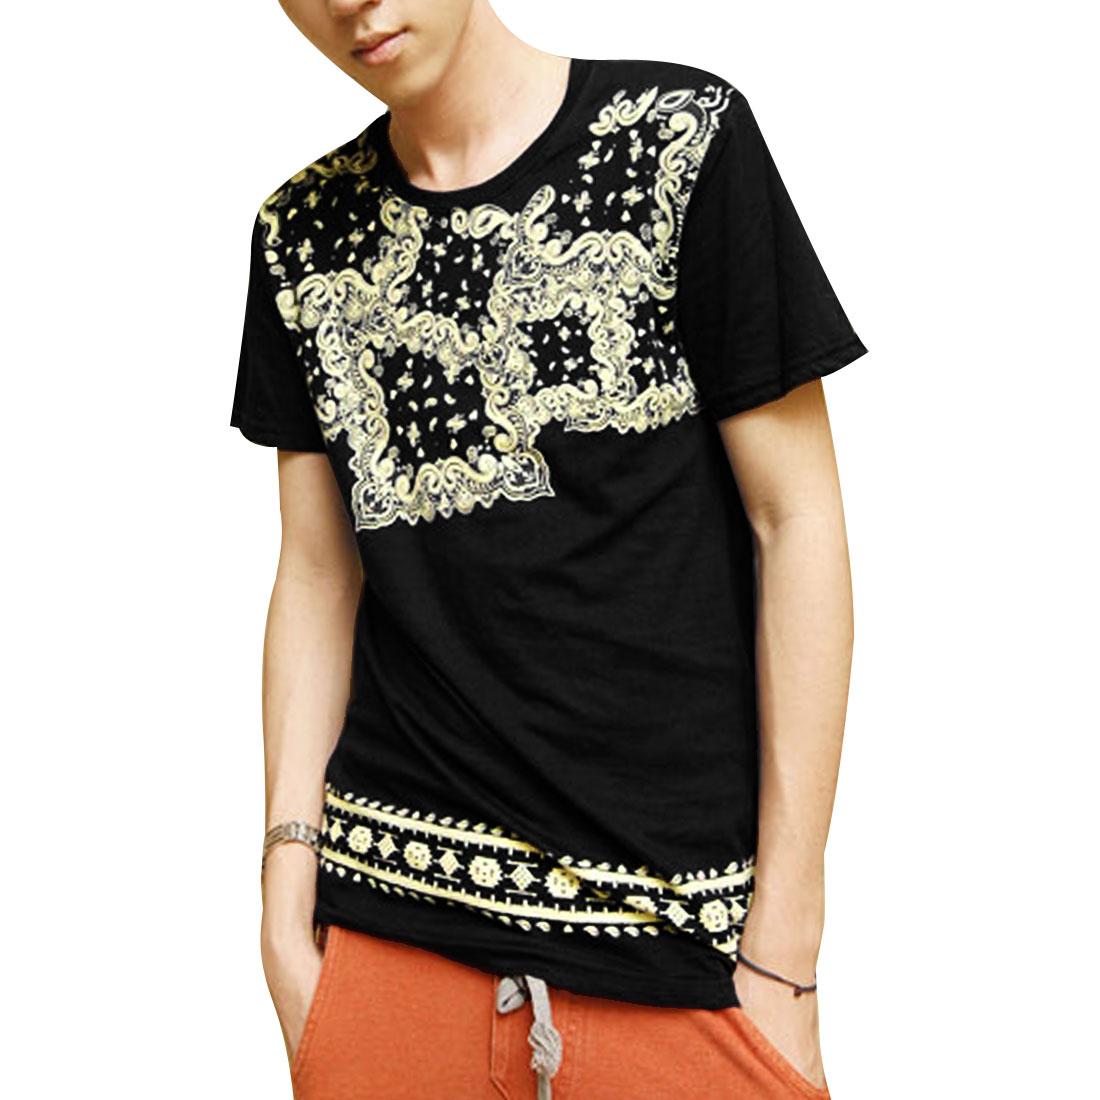 Round Neck Paisley Print Leisure T-Shirt Blouse Black M for Men